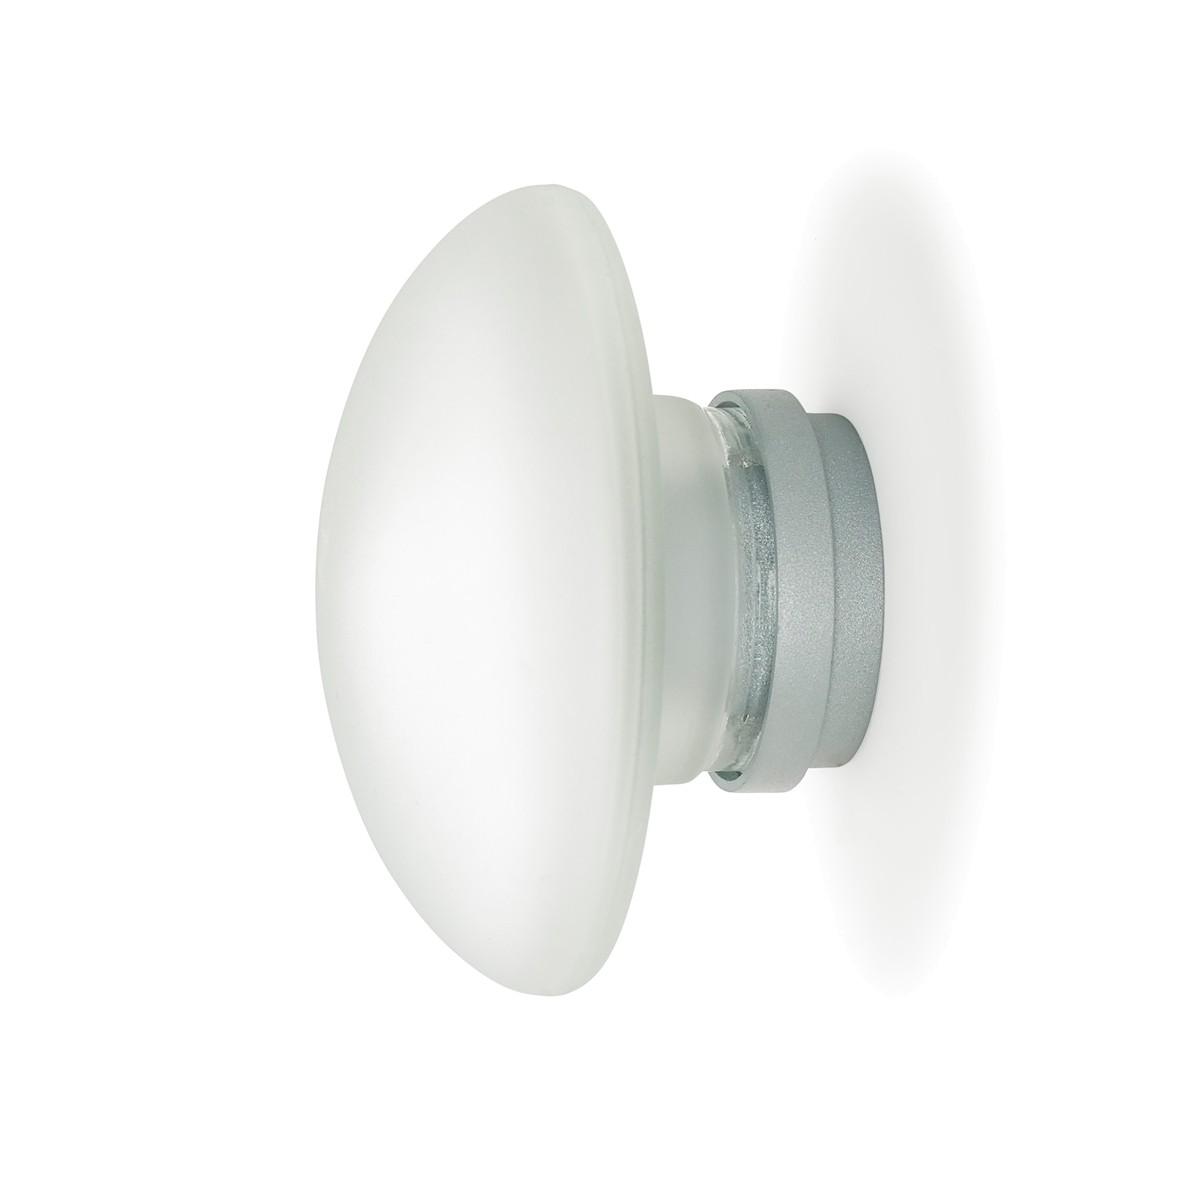 Fontana Arte Sillaba LED Wand- / Deckenleuchte IP40, Ø: 14 cm, Glas sandgestrahlt